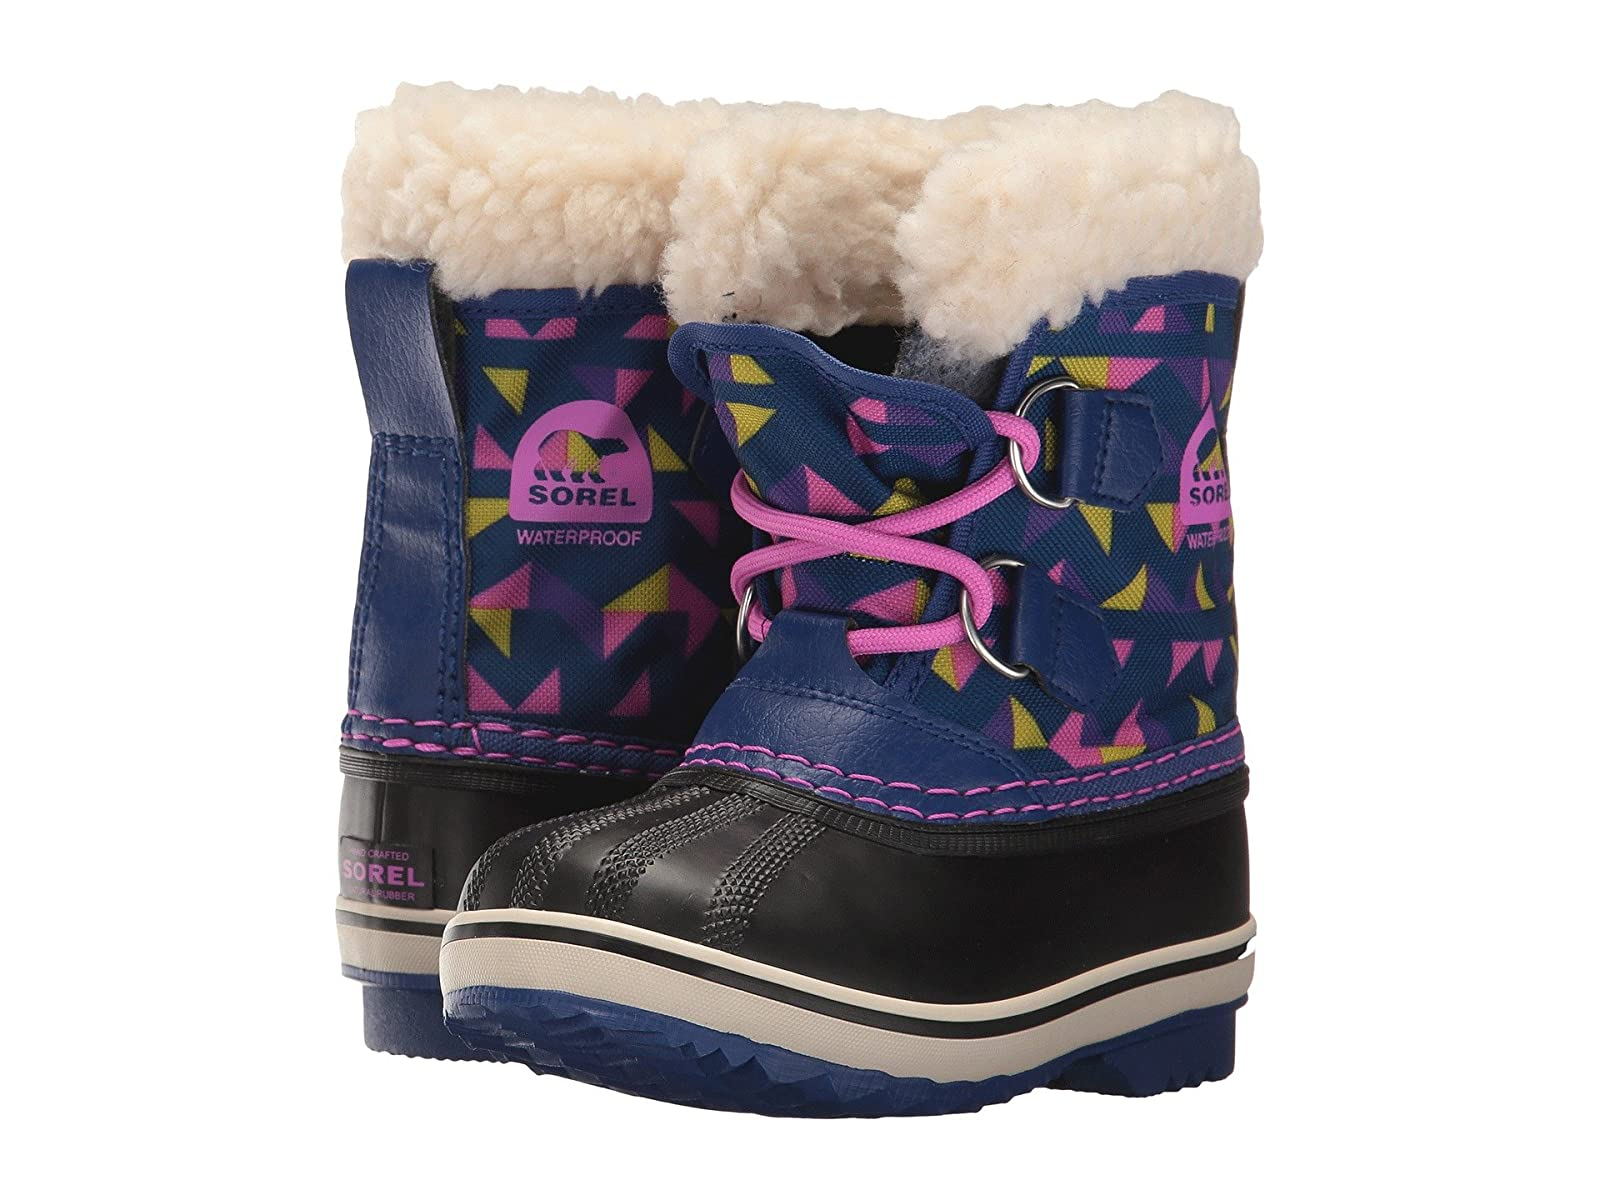 SOREL Kids Yoot Pac Nylon Print (Toddler/Little Kid)Cheap and distinctive eye-catching shoes